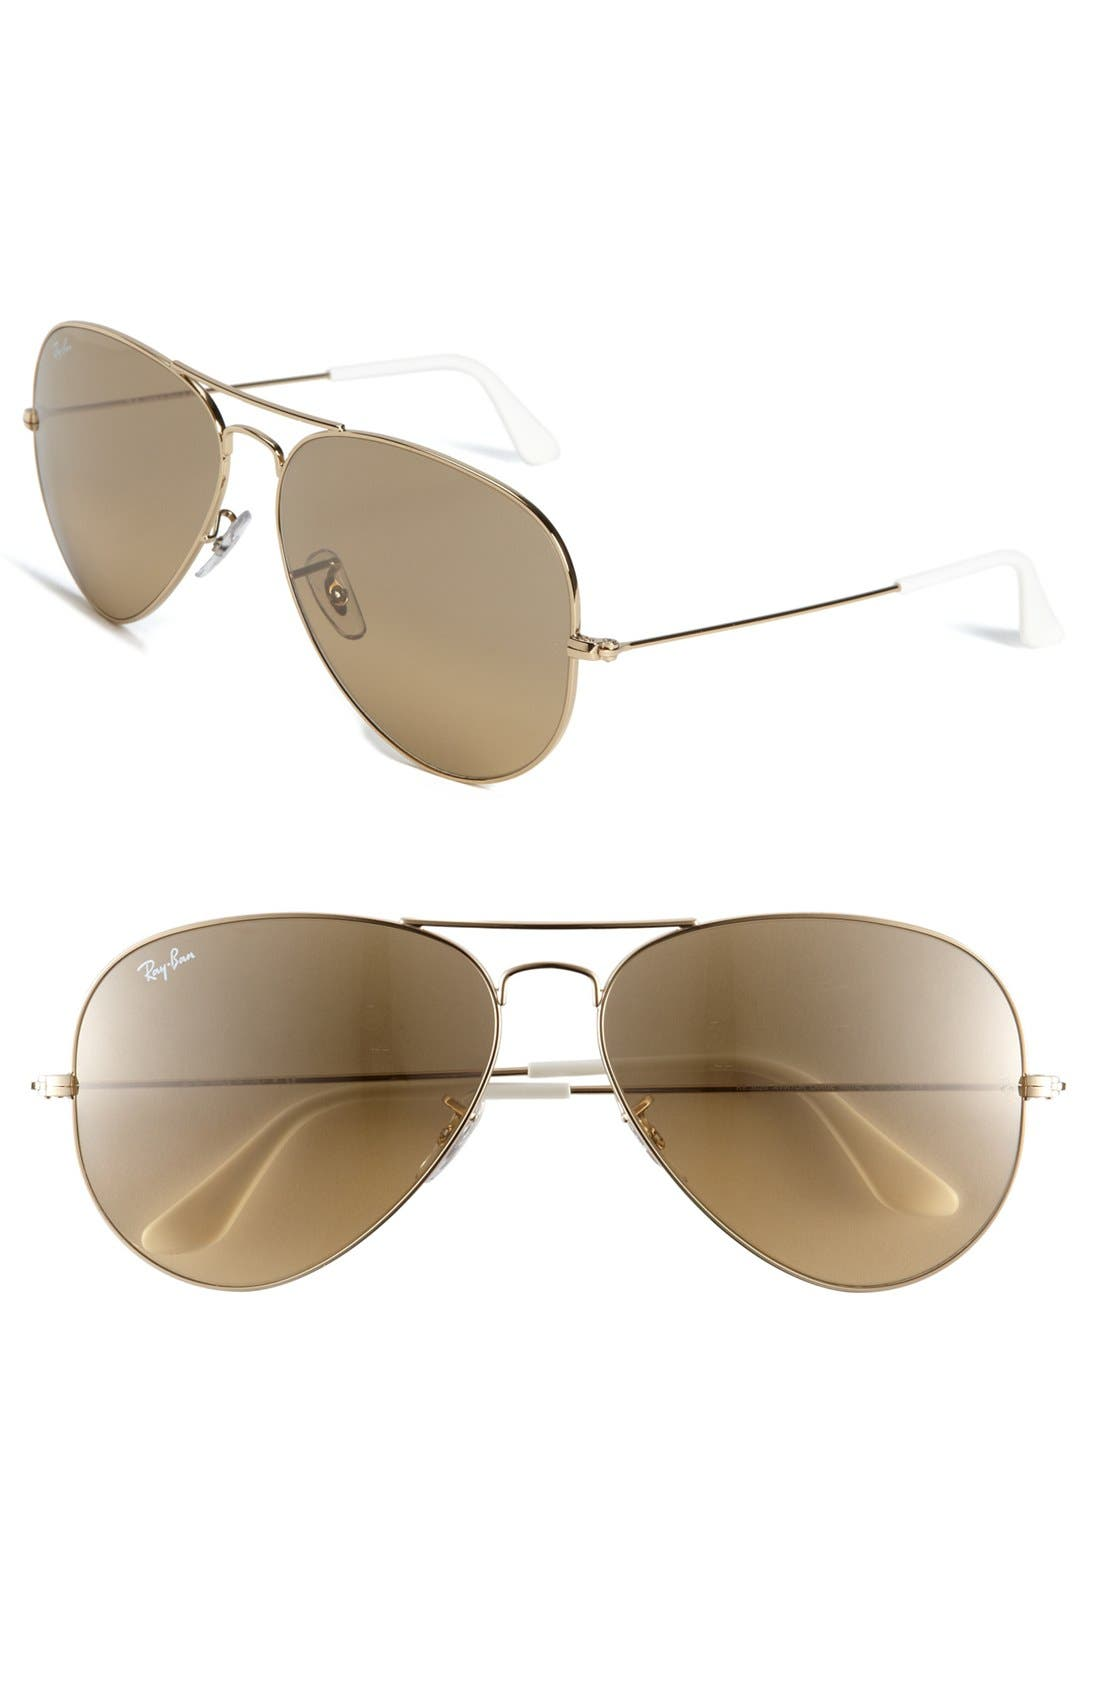 original aviators  Ray-Ban Large Original 62mm Aviator Sunglasses